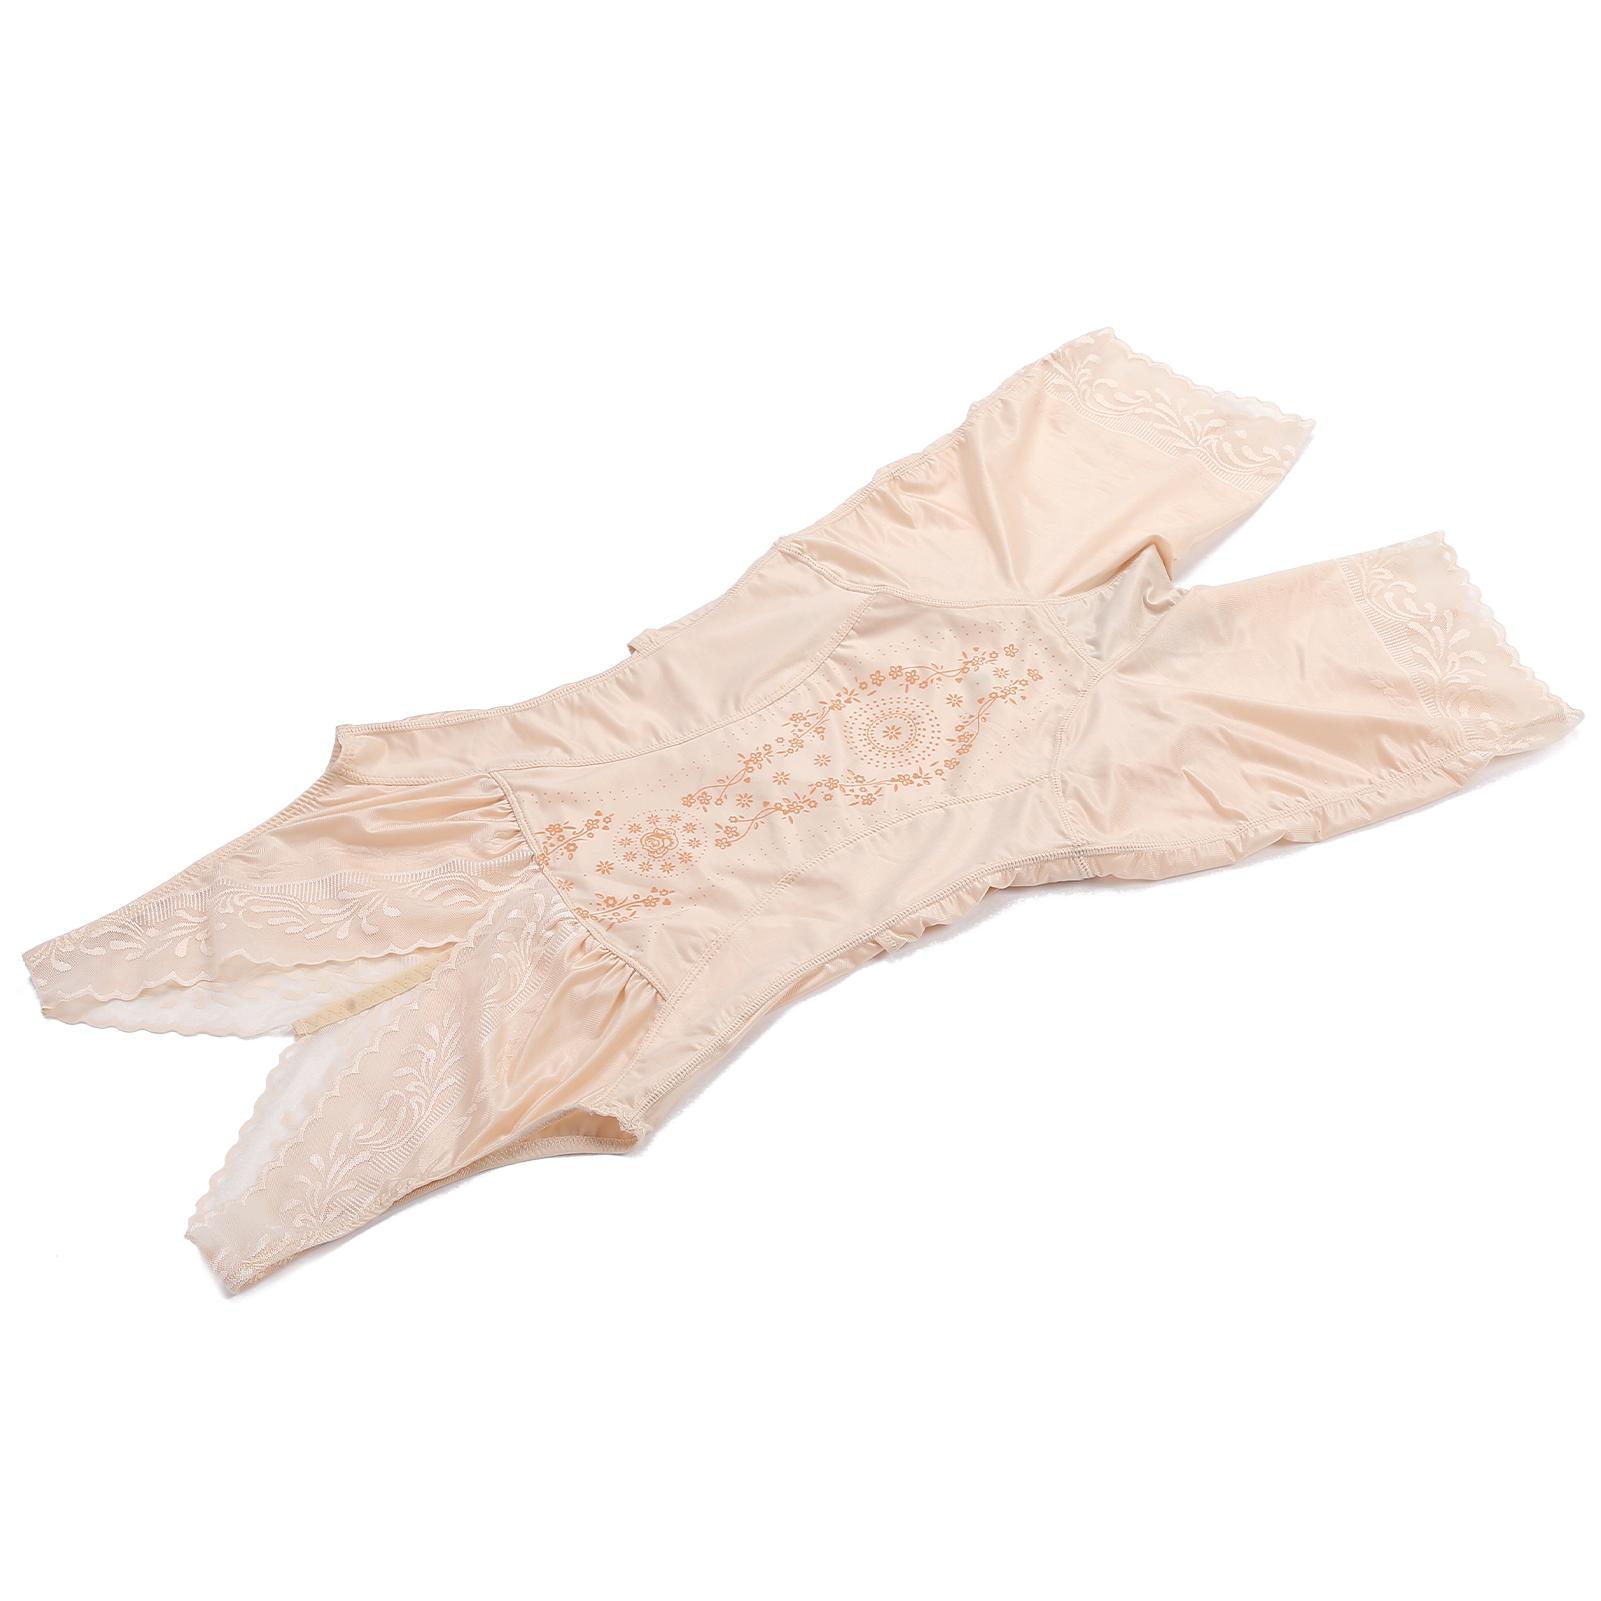 miniature 18 - Women's Full Body Taille Trainer Shaper Taille Corset underbust corset shapewear